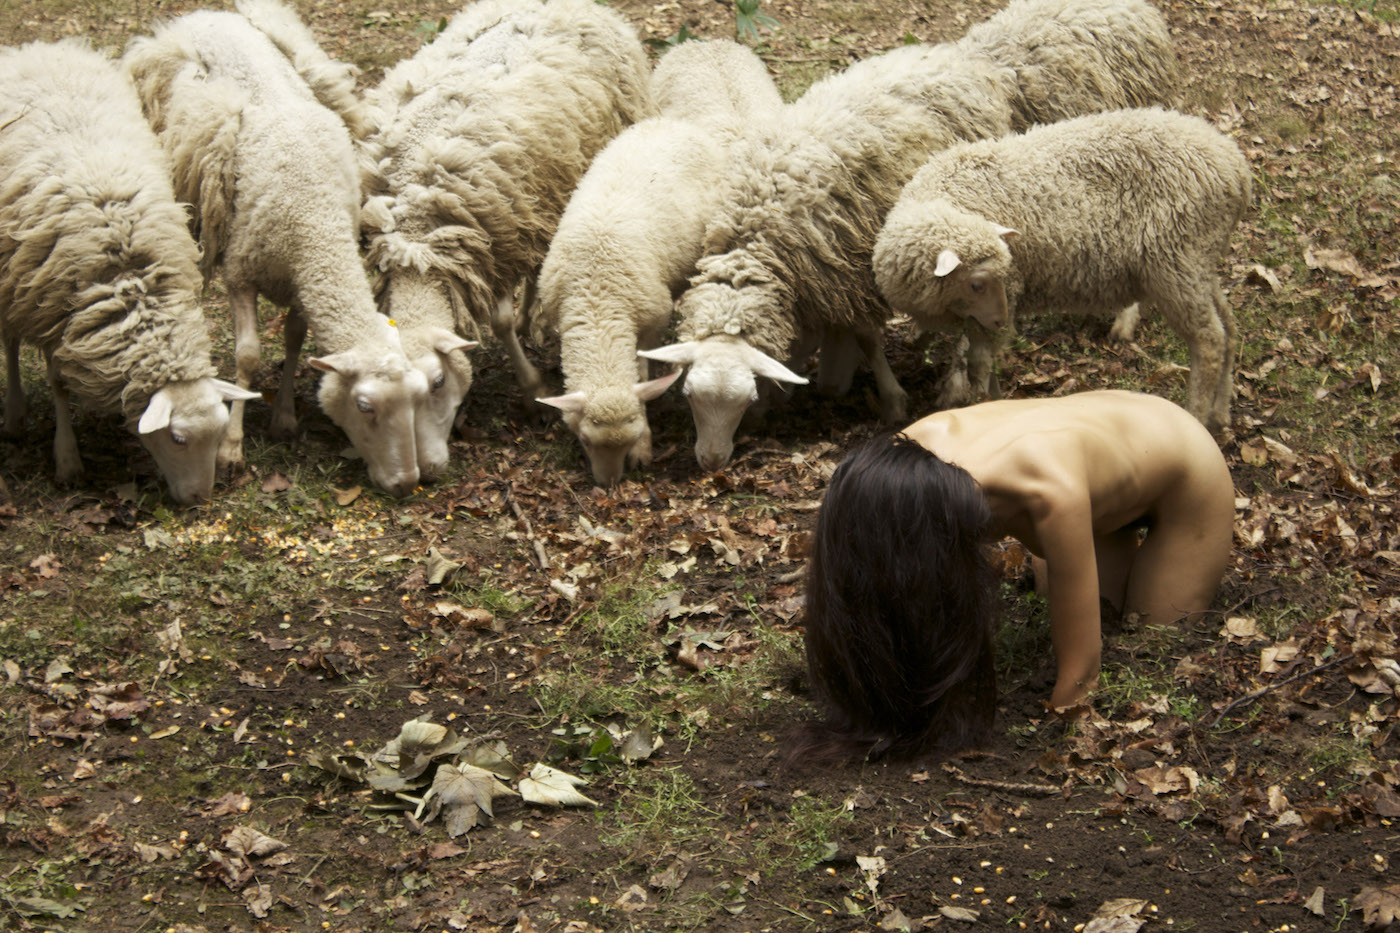 "Regina José Galindo, La oveja negra, 2014, video-6'21"", RAVE-East-Village-Artist-Residency-2014. Foto: Nico-Covre-courtesy-of-Prometeogallery-di-Ida-Pisani-Milano"